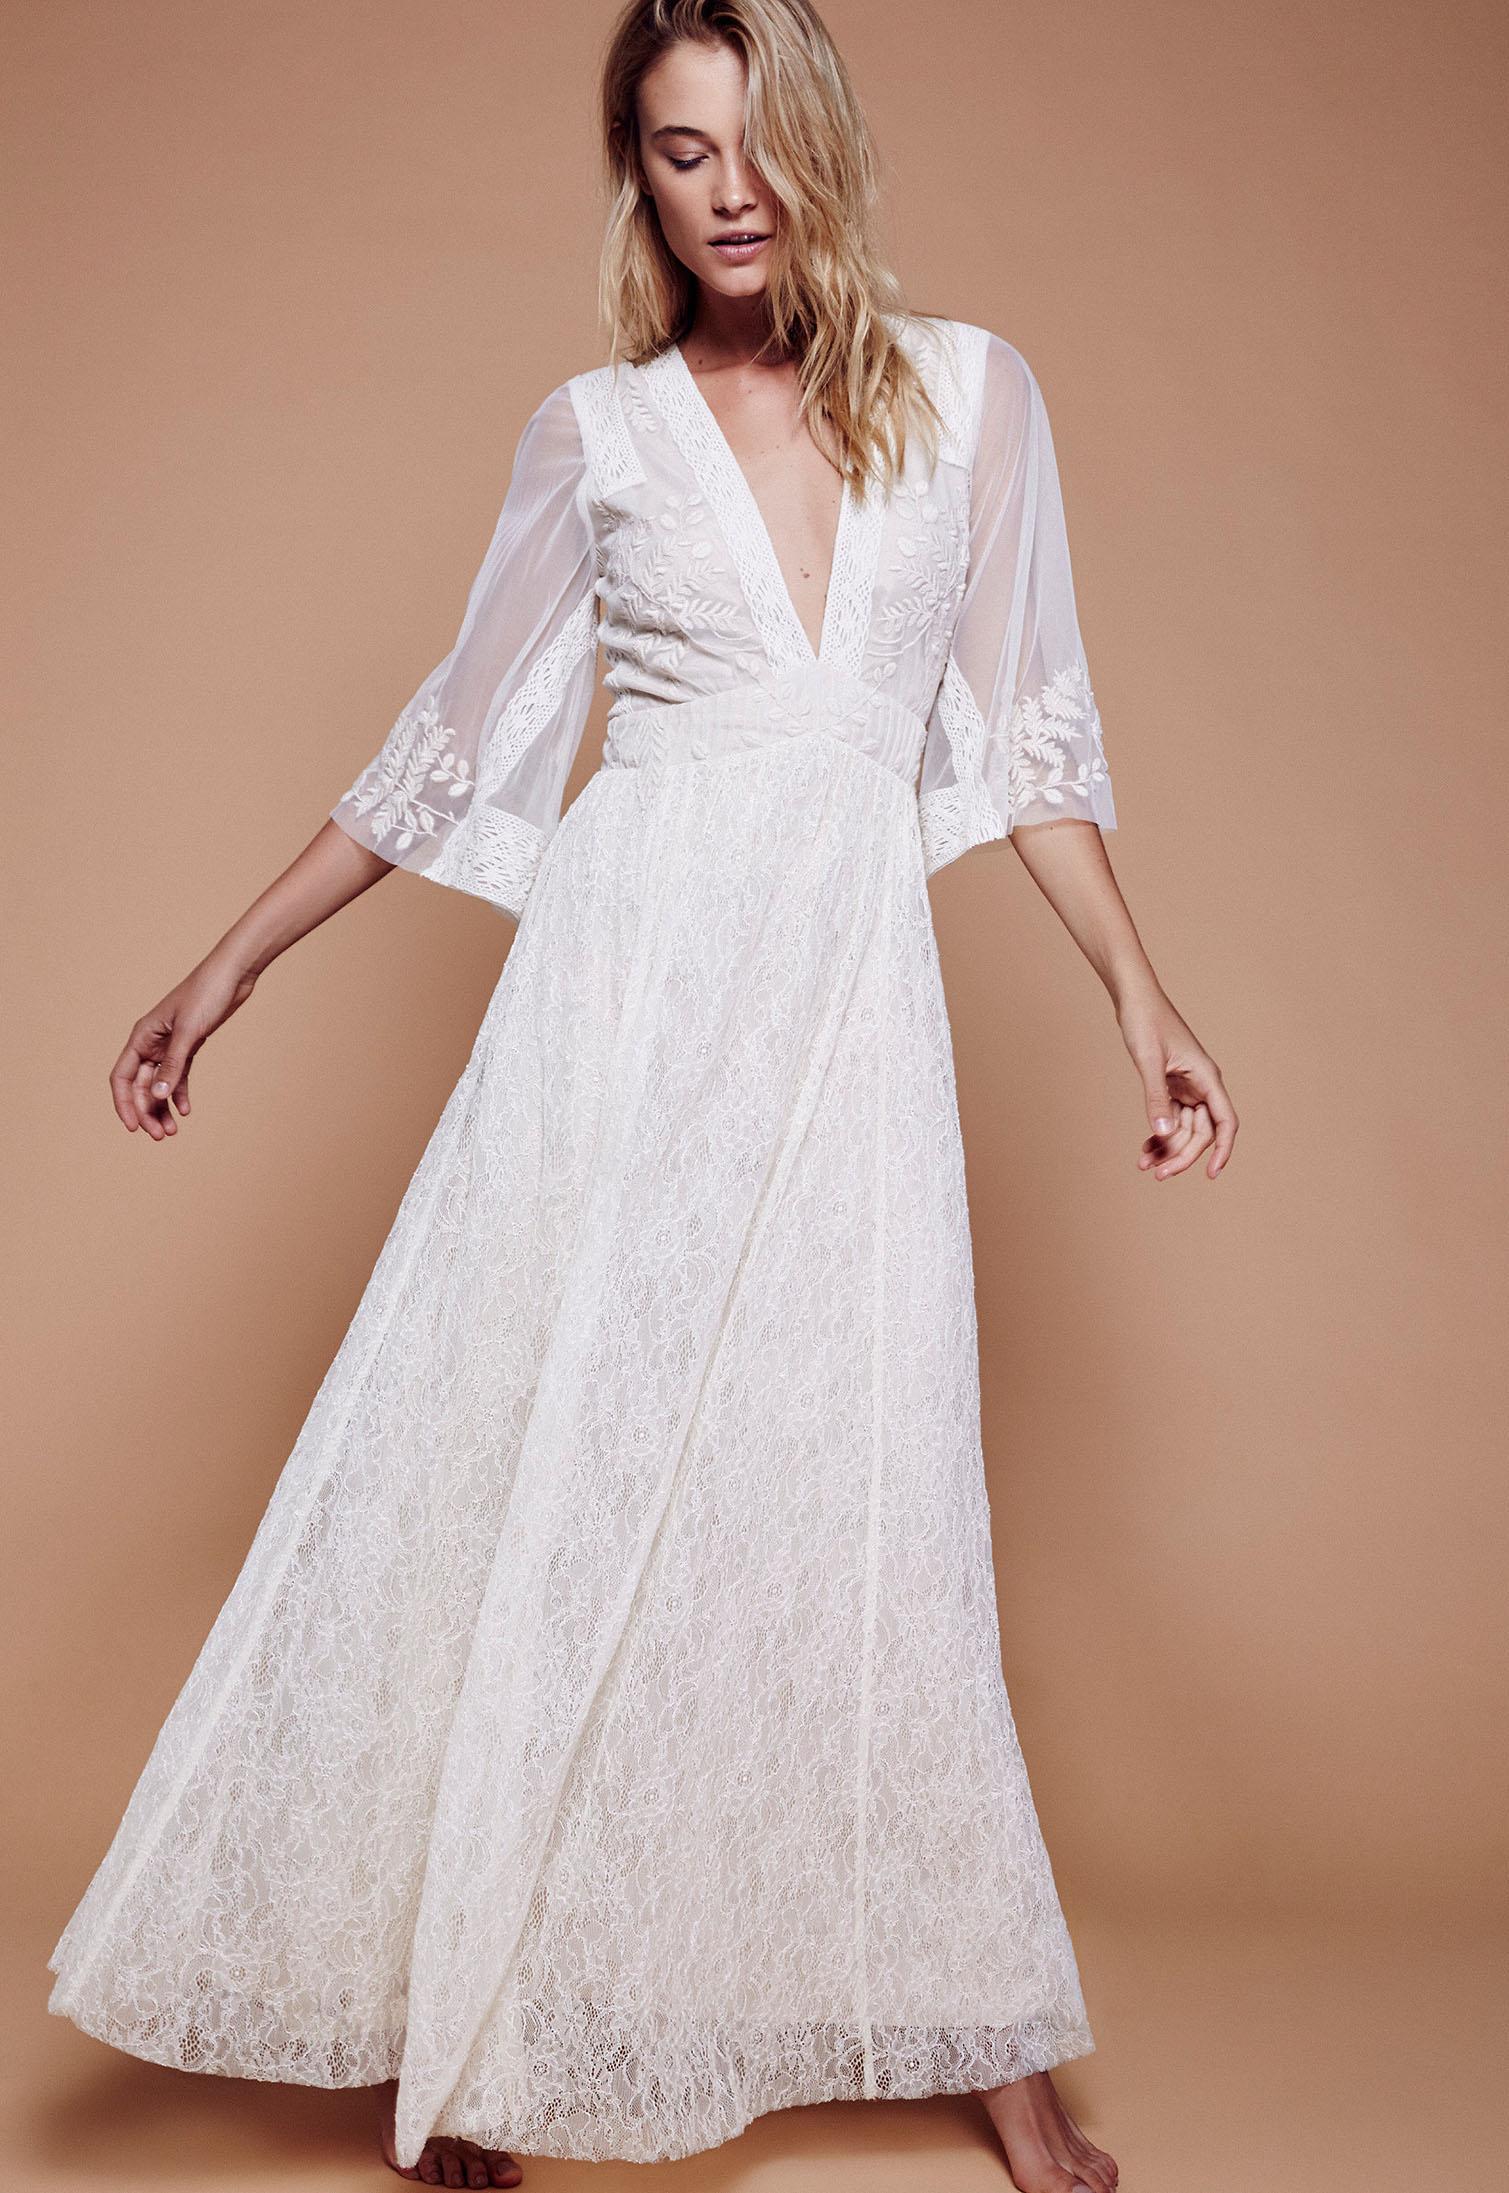 Eclair lace maxi dress green wedding shoes weddings for Shoes for maxi dress wedding